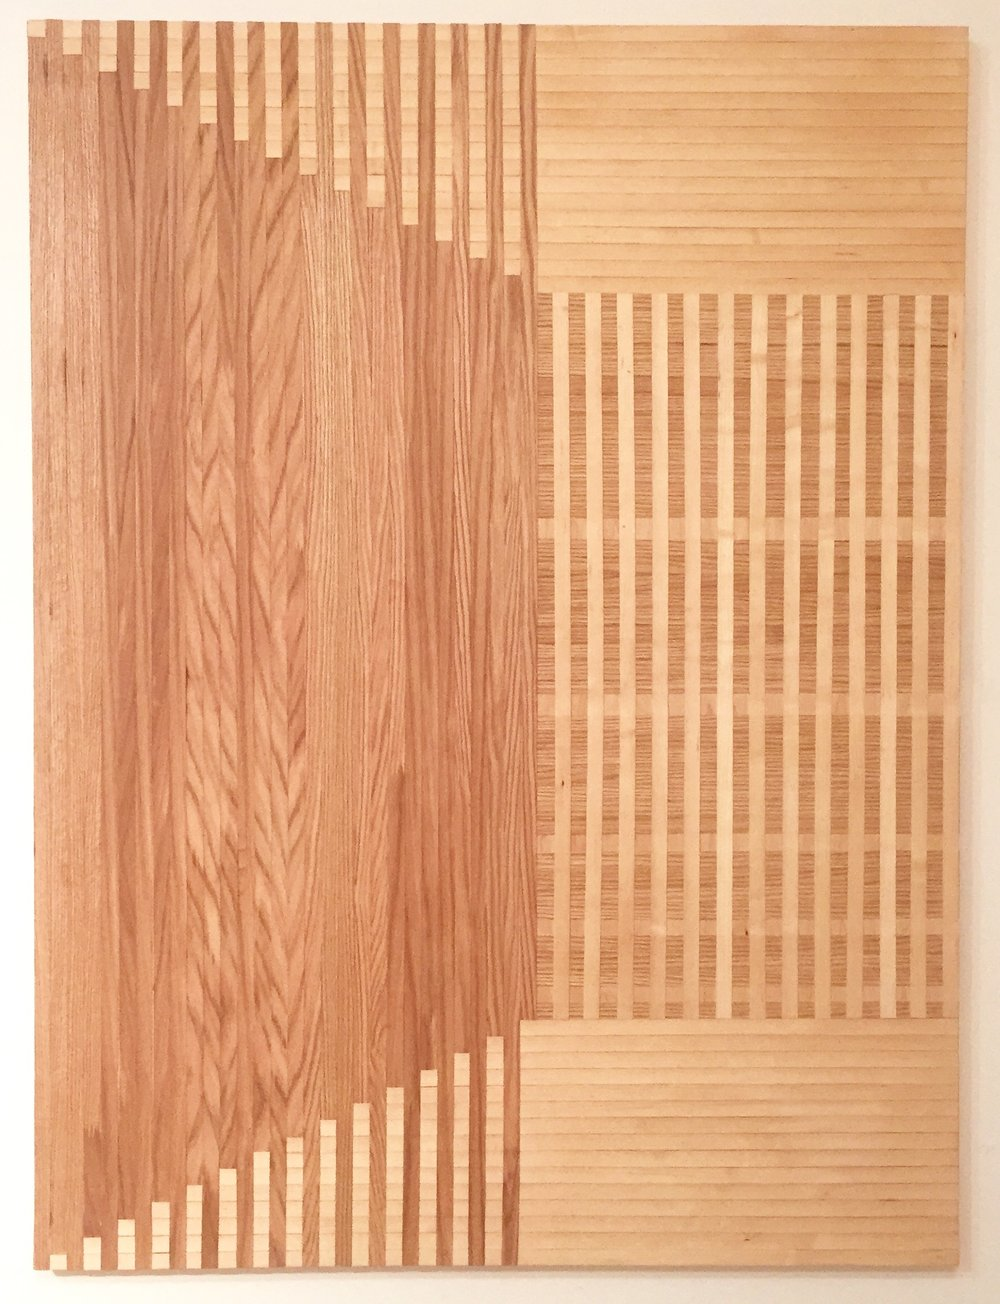 denouement  2015 red oak and birch veneer edge banding on panel  60 x 45 in